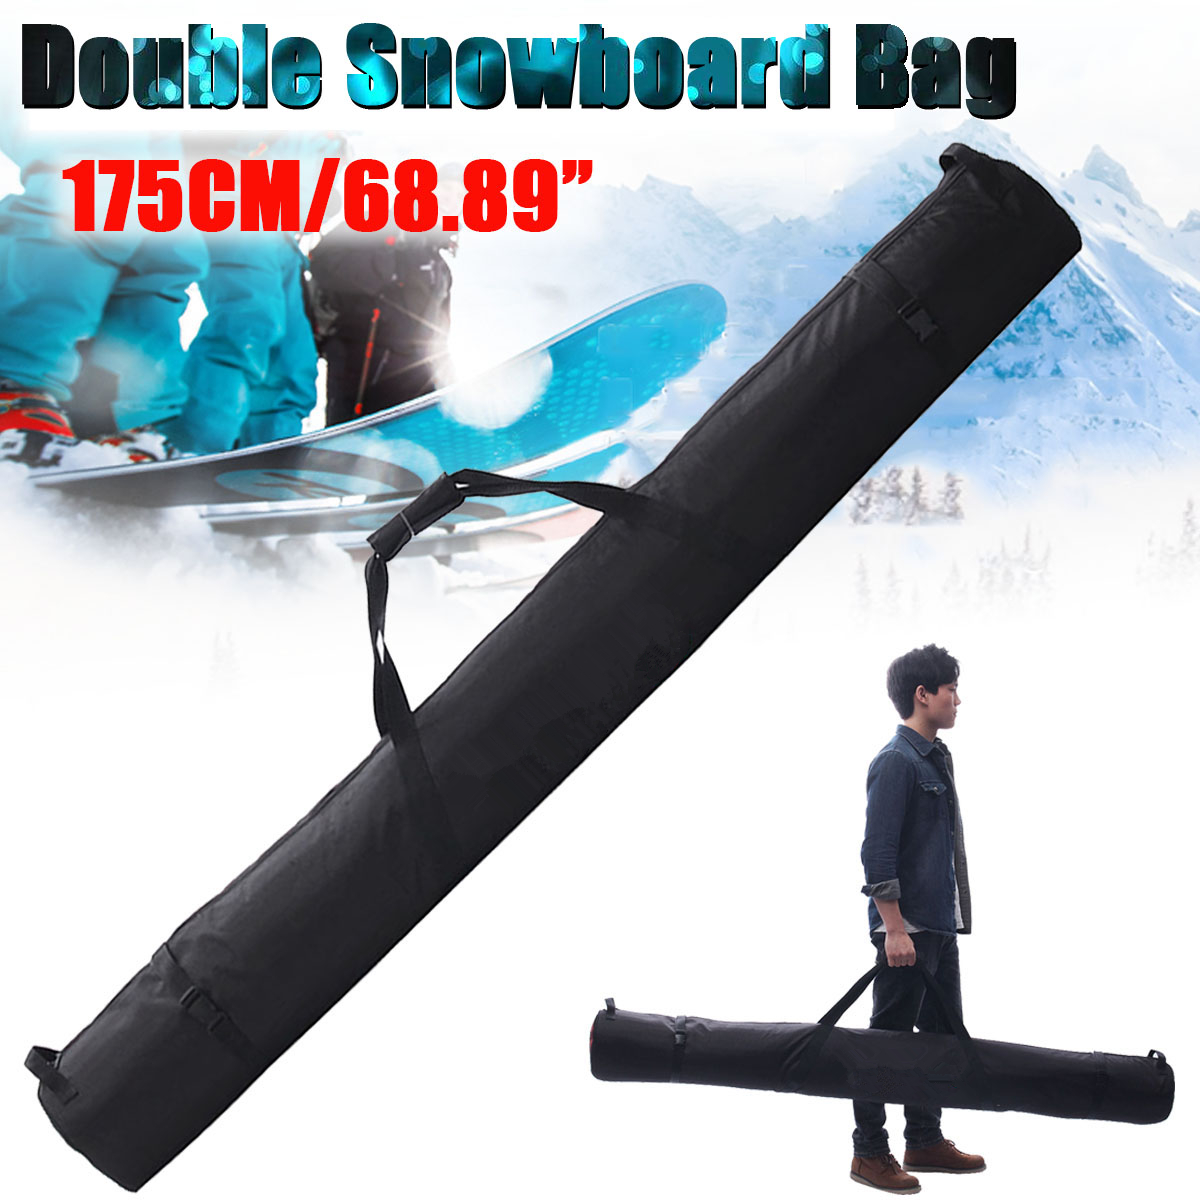 Faithful 175cm/69 Inch Snowboard Skiing Bag For Double Snowboard In Polyester Sport Snowboard Bag Ski Bag Snowboard Bag Pure Whiteness